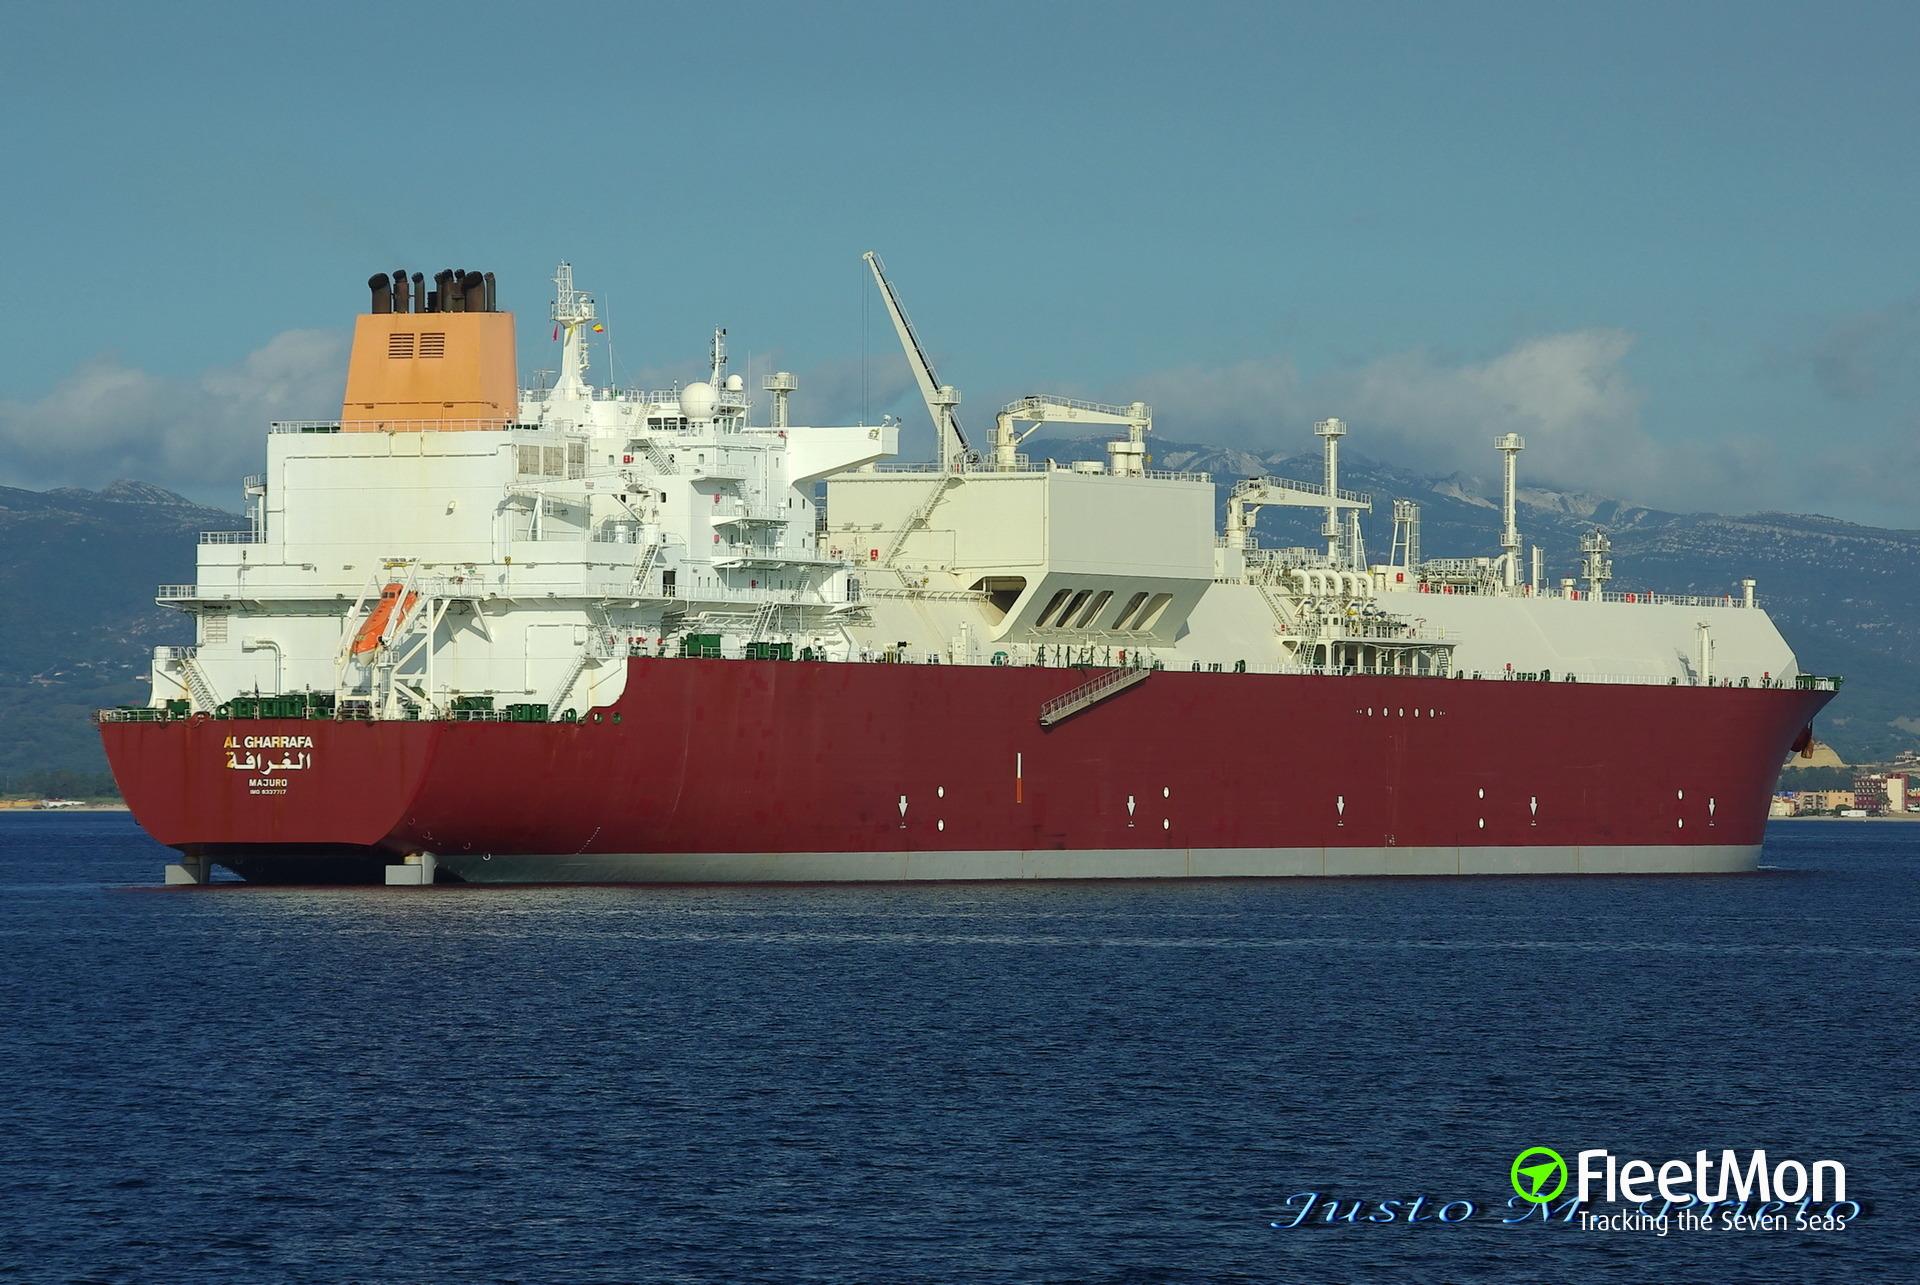 Mega LNG tanker Al Gharrafa collided with mega boxship Hanjin Italy, Malacca Strait